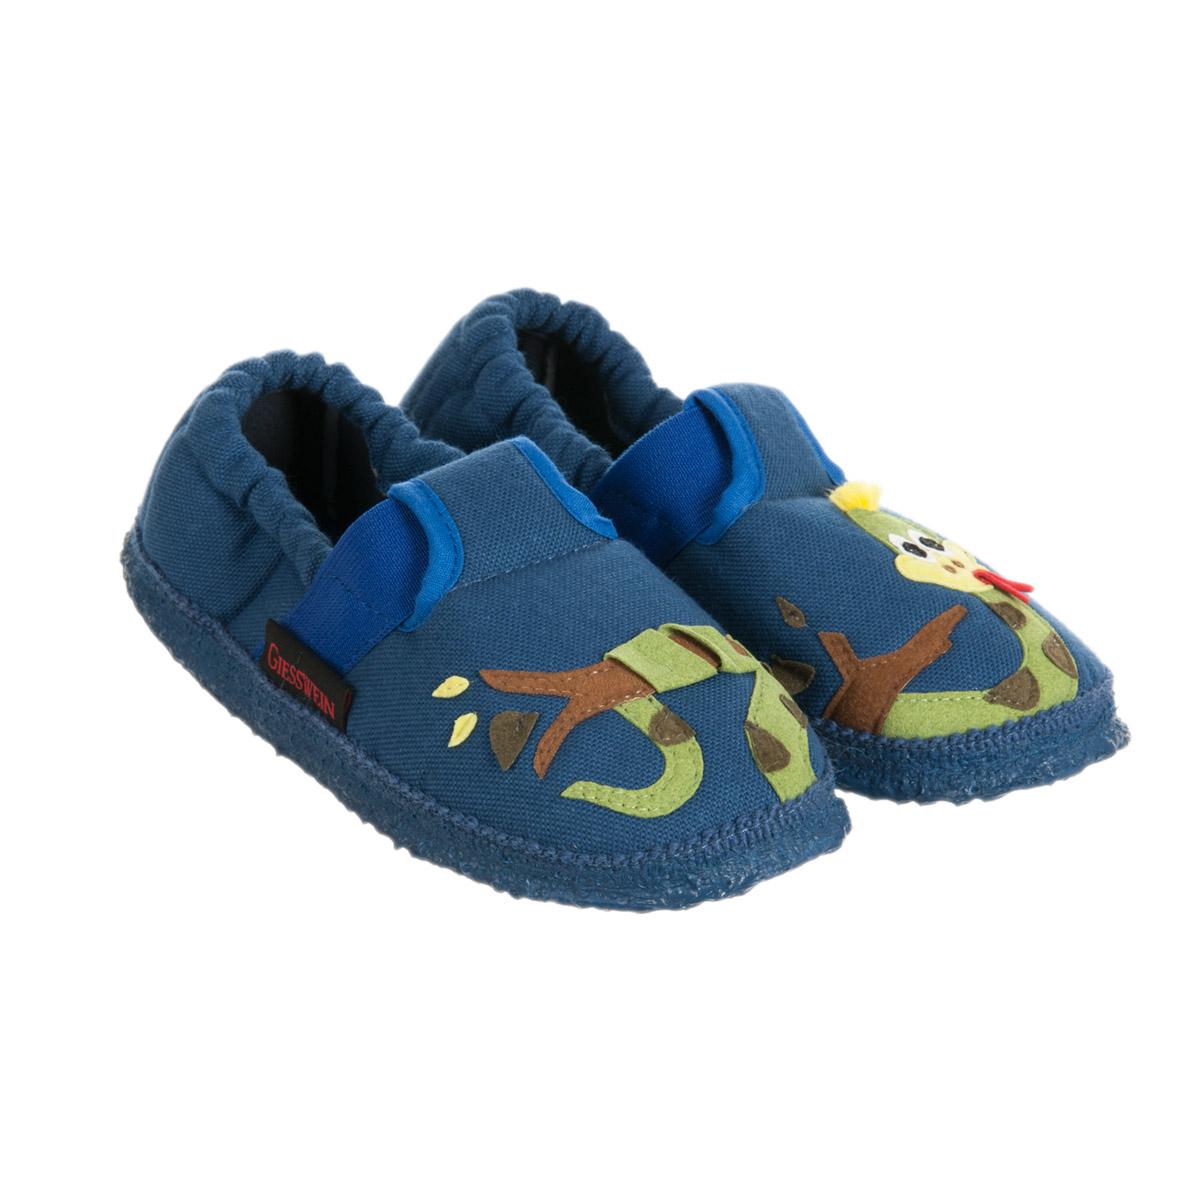 online store 47446 b4e7b pantofole da ragazzo con suola antiscivolo Atzelgift firmato GIESSWEIN